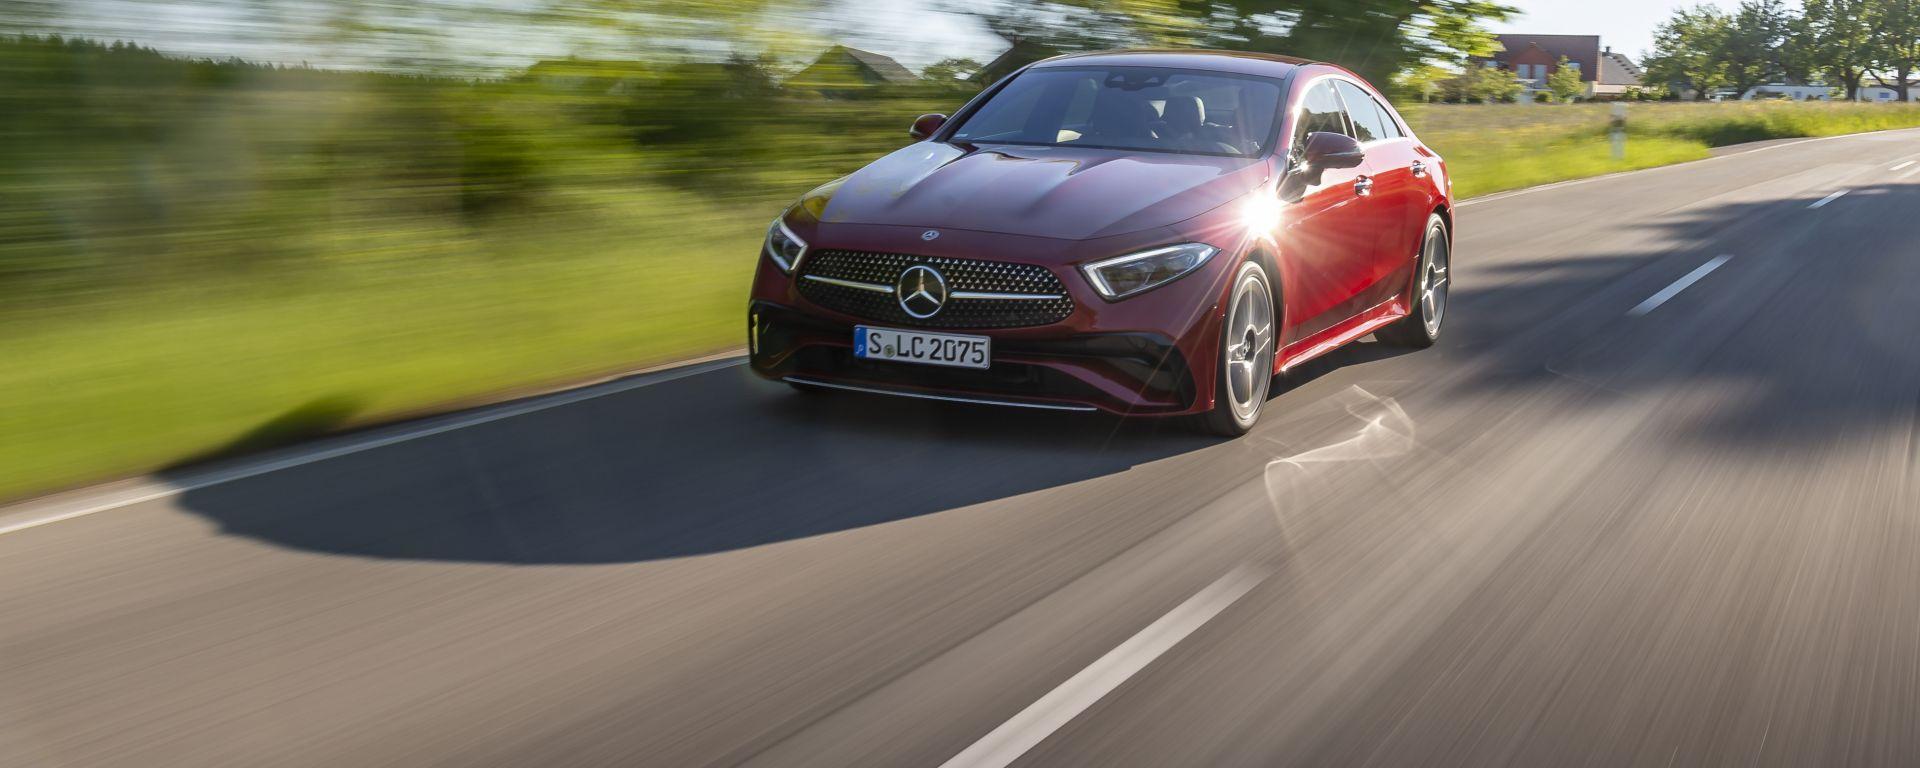 Nuova Mercedes CLS 2021: design e tecnologia all'avanguardia